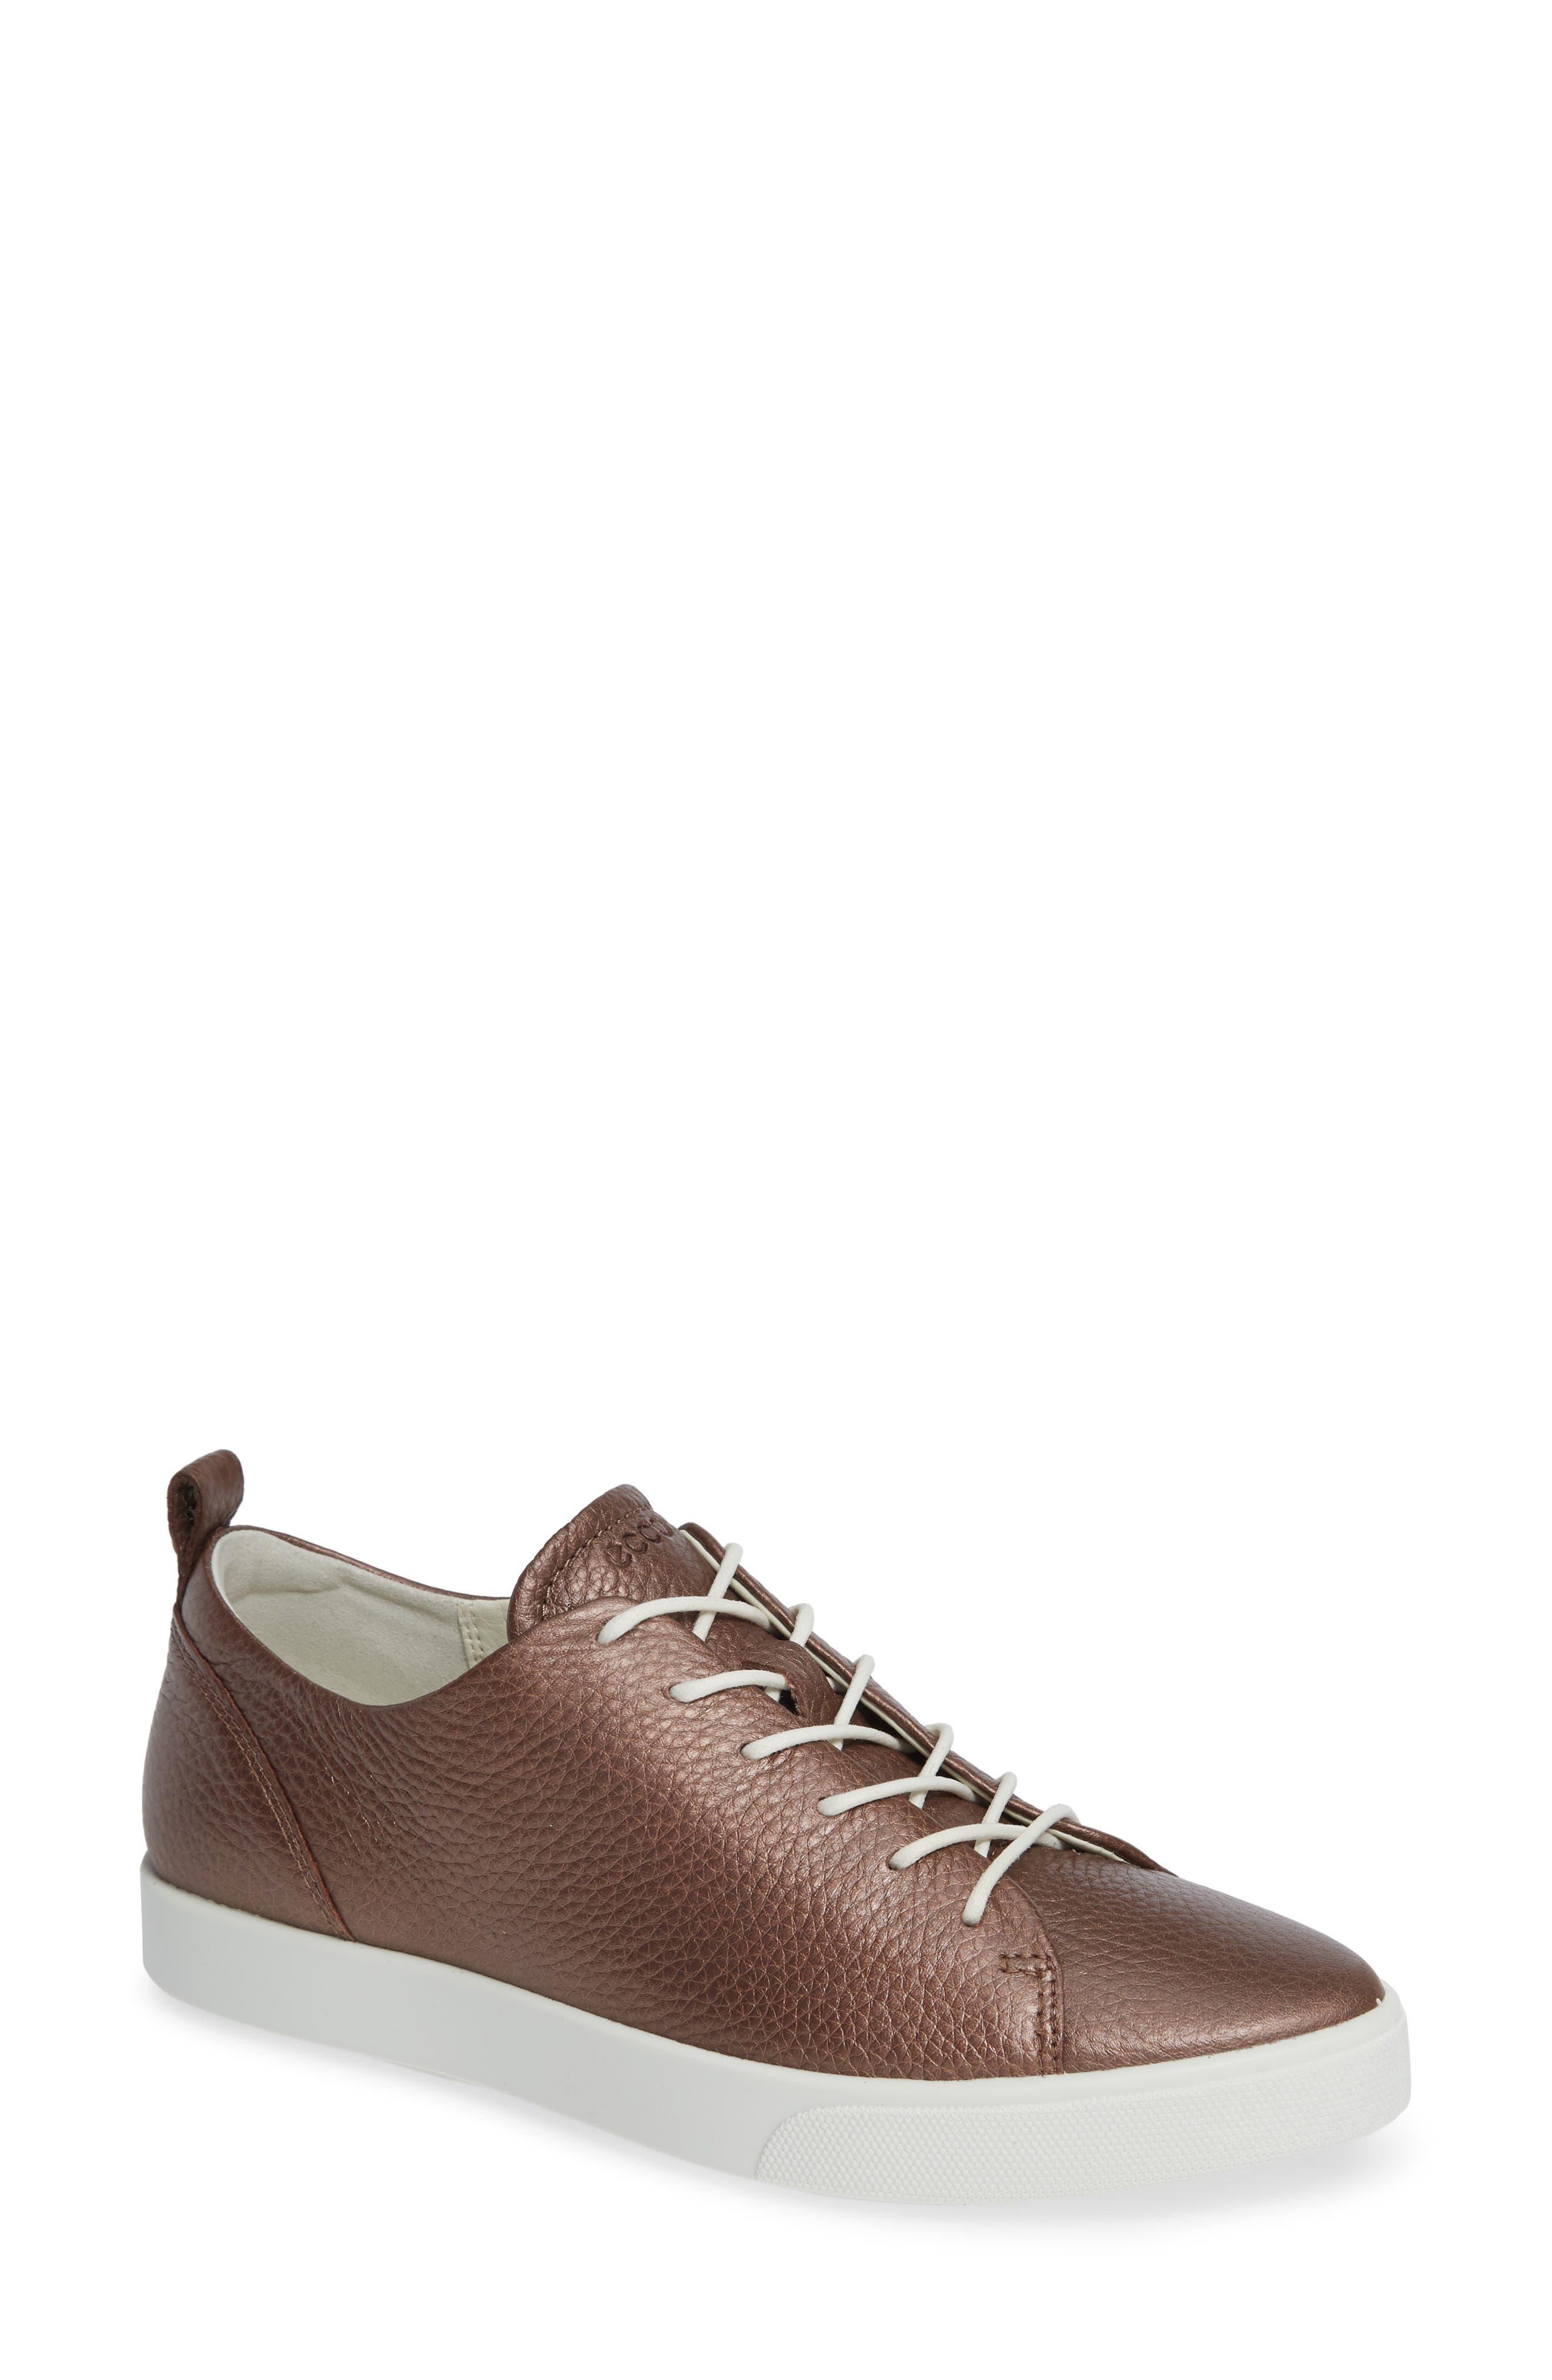 Gillian Sneaker,                         Main,                         color, DEEP TAUPE/ BRONZE LEATHER